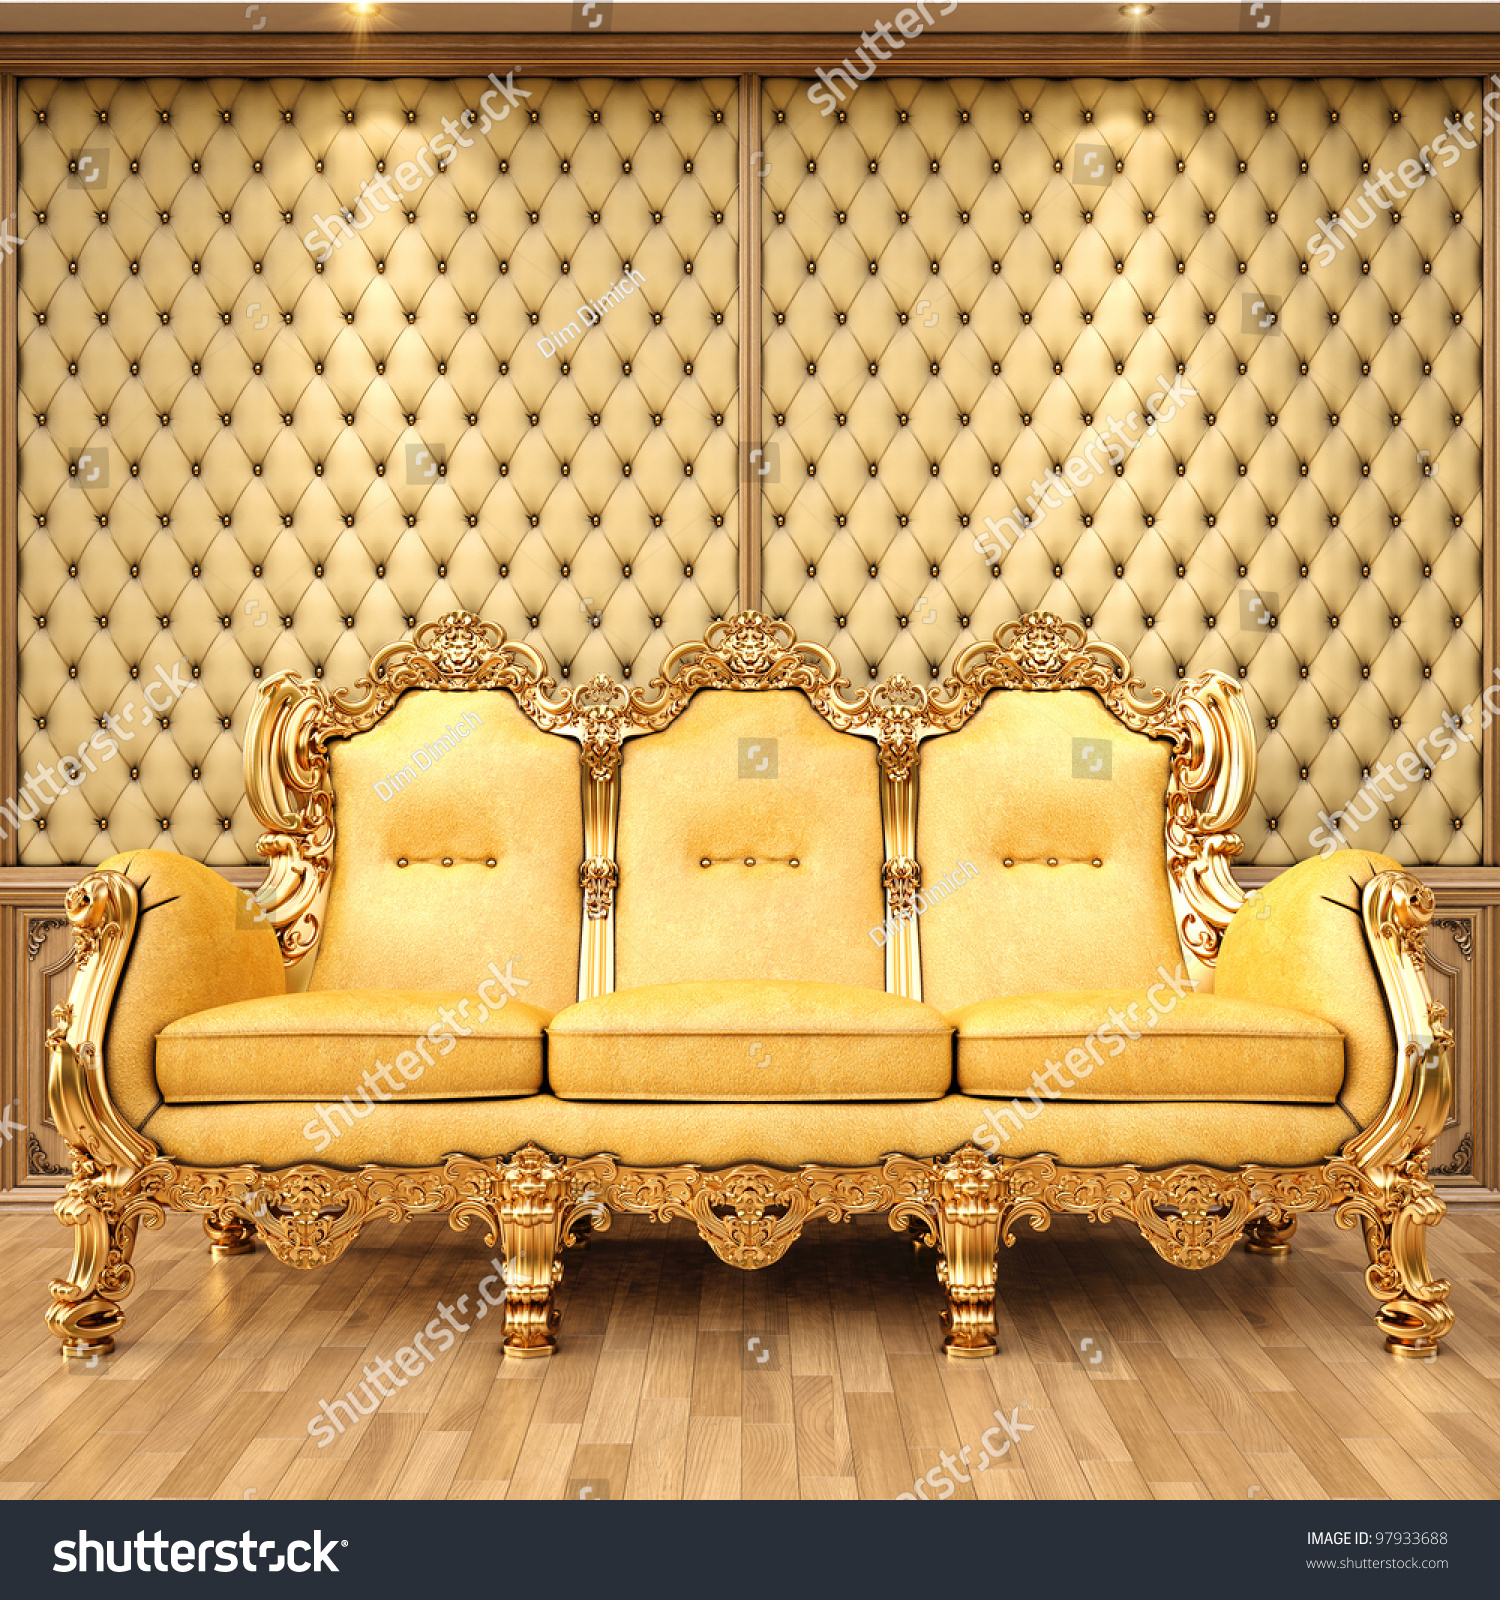 Golden Sofa In The Luxurious Interior.